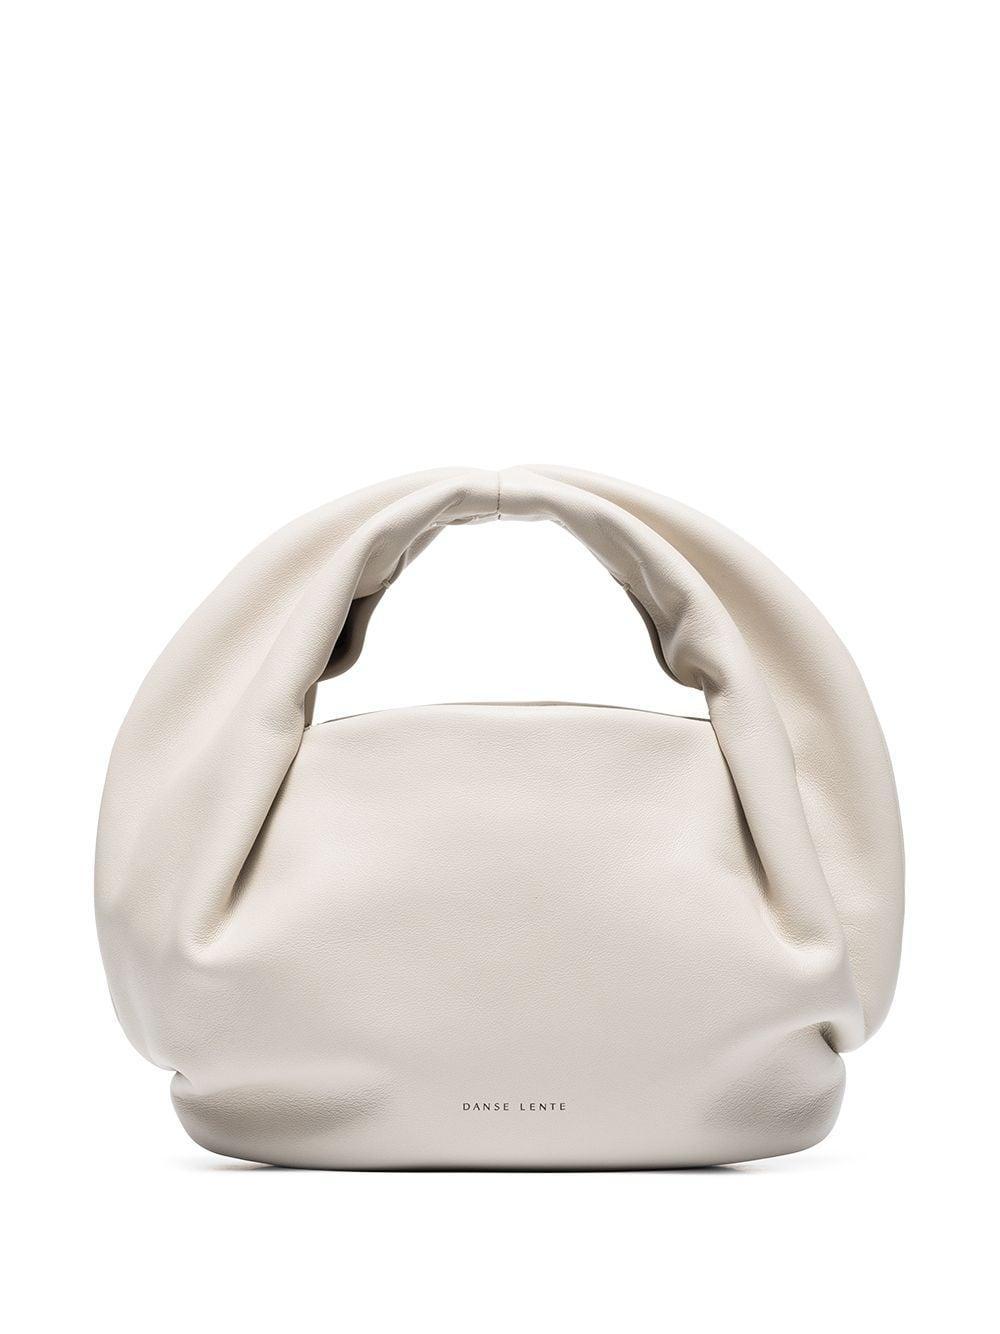 Lola Sphere Bag Item # S21-44-3404